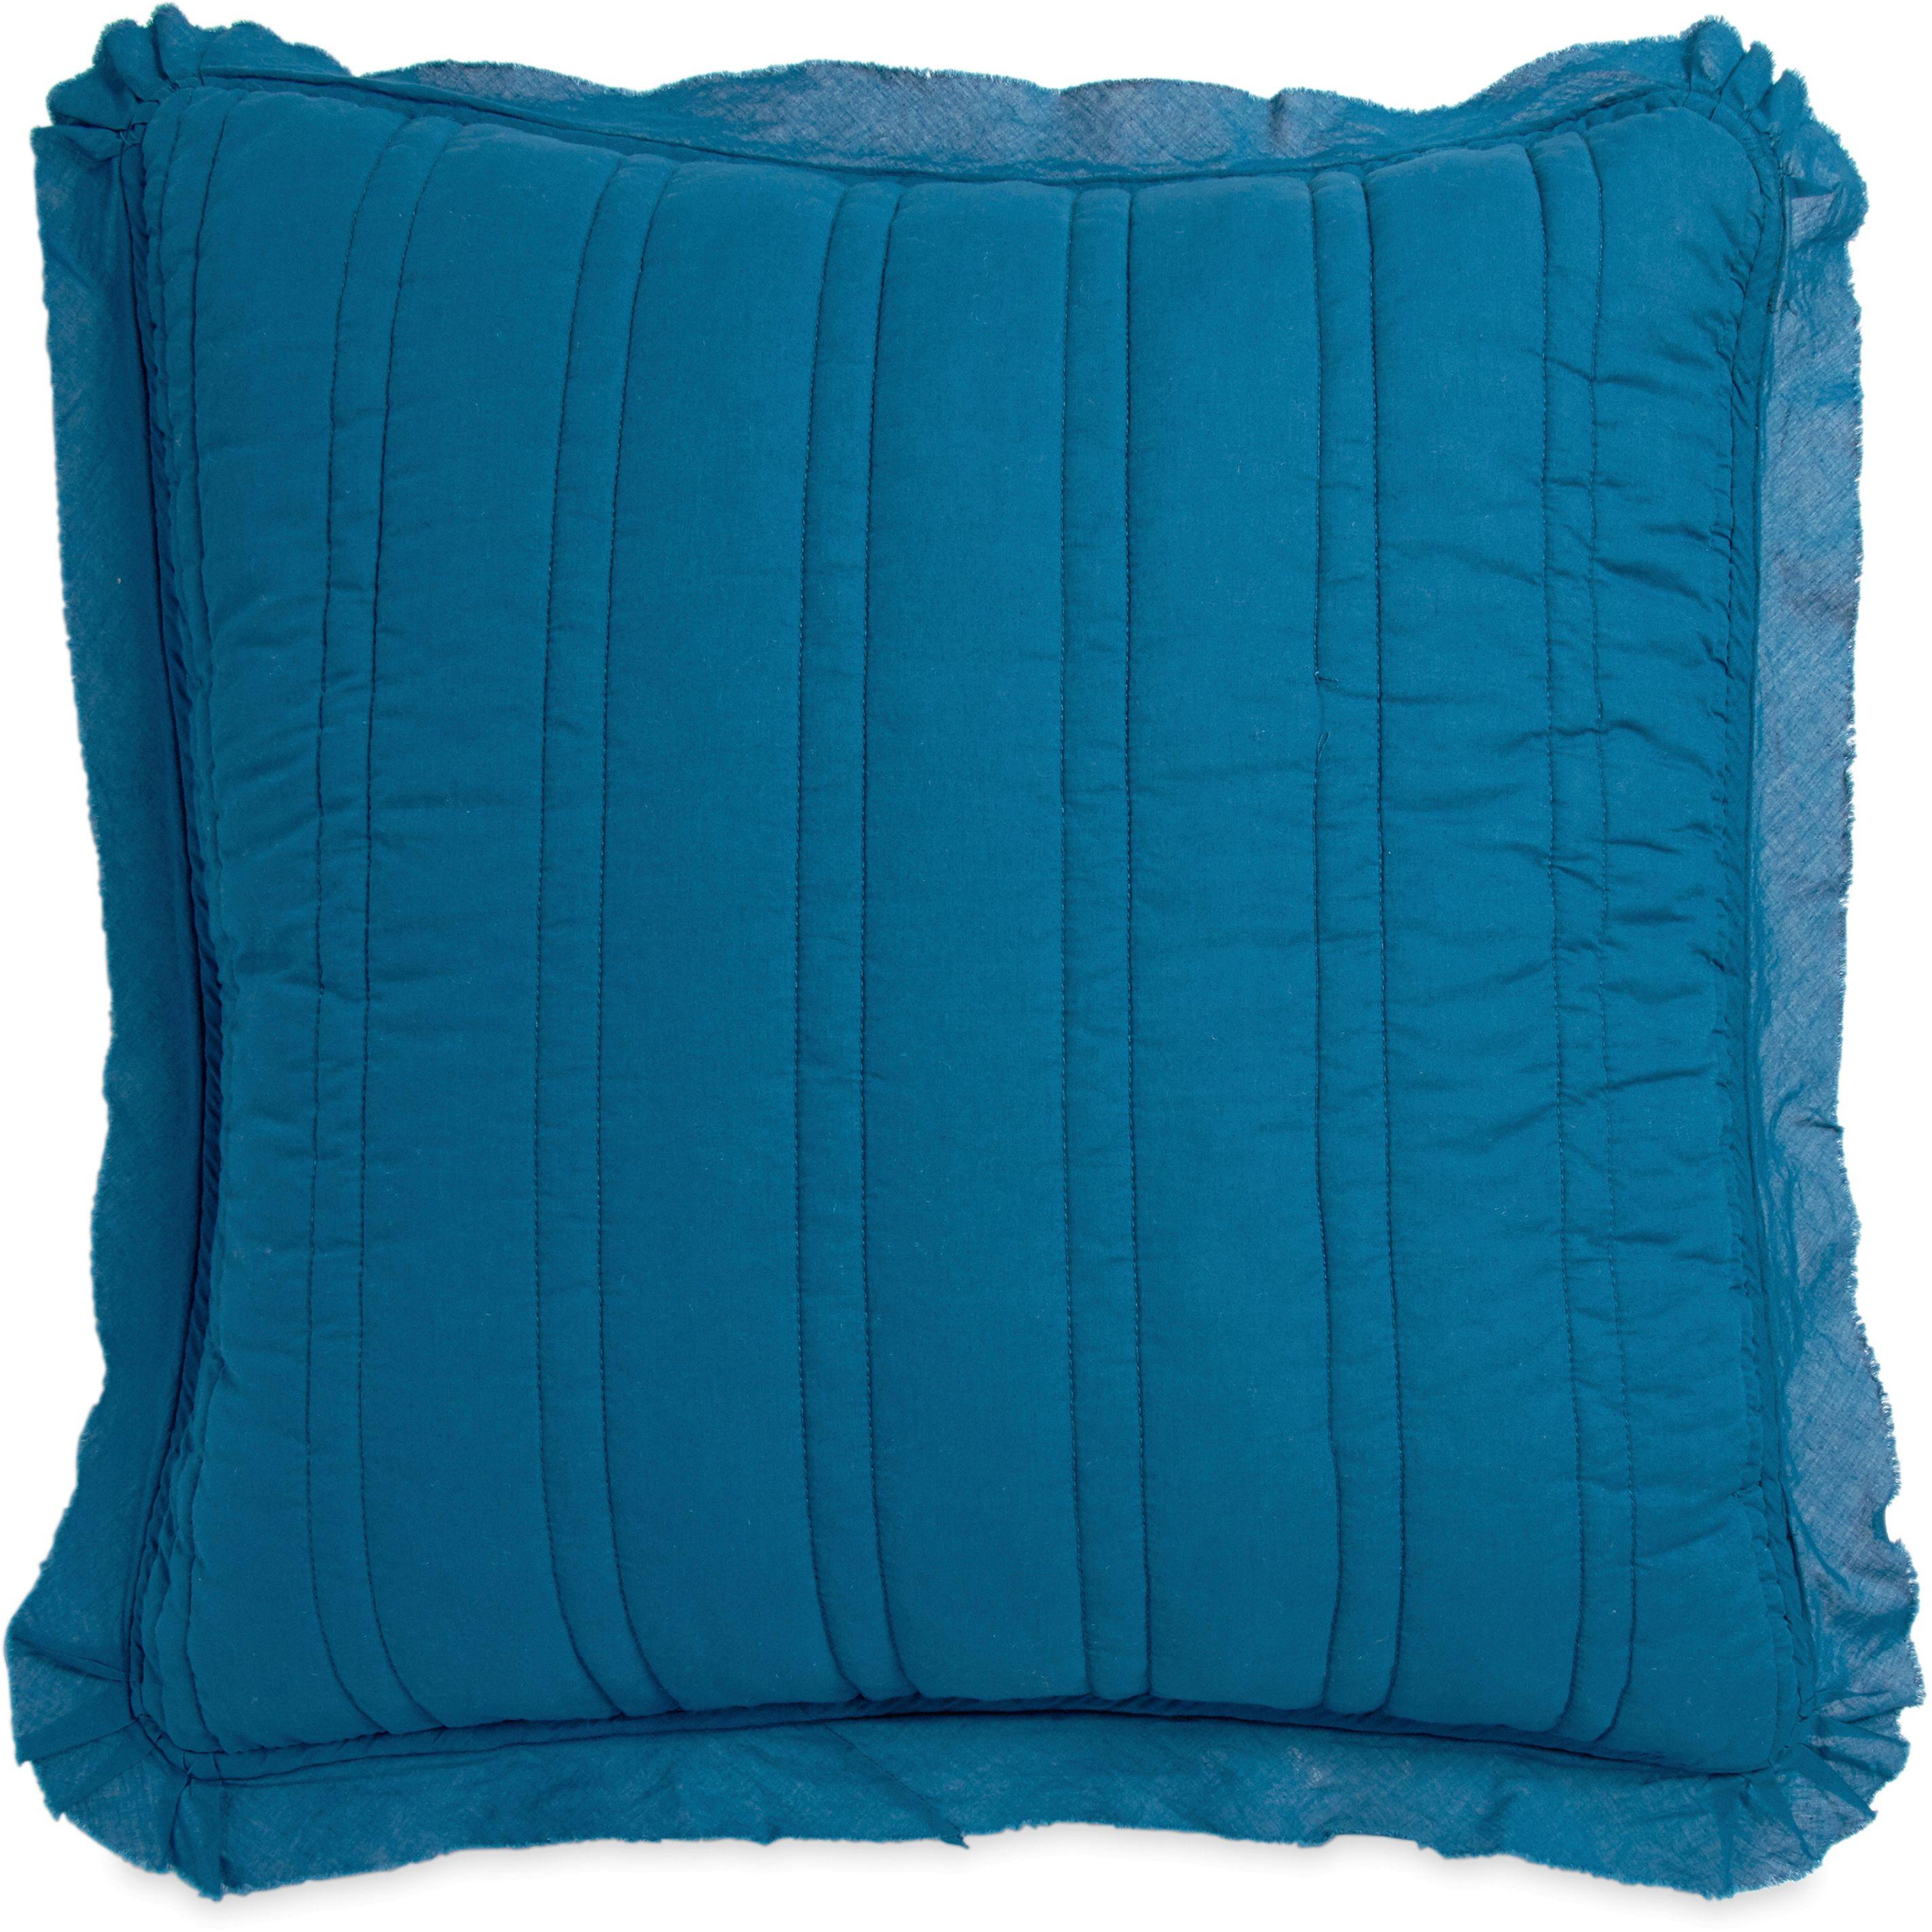 The pioneer woman double stitch sham set, euro blue